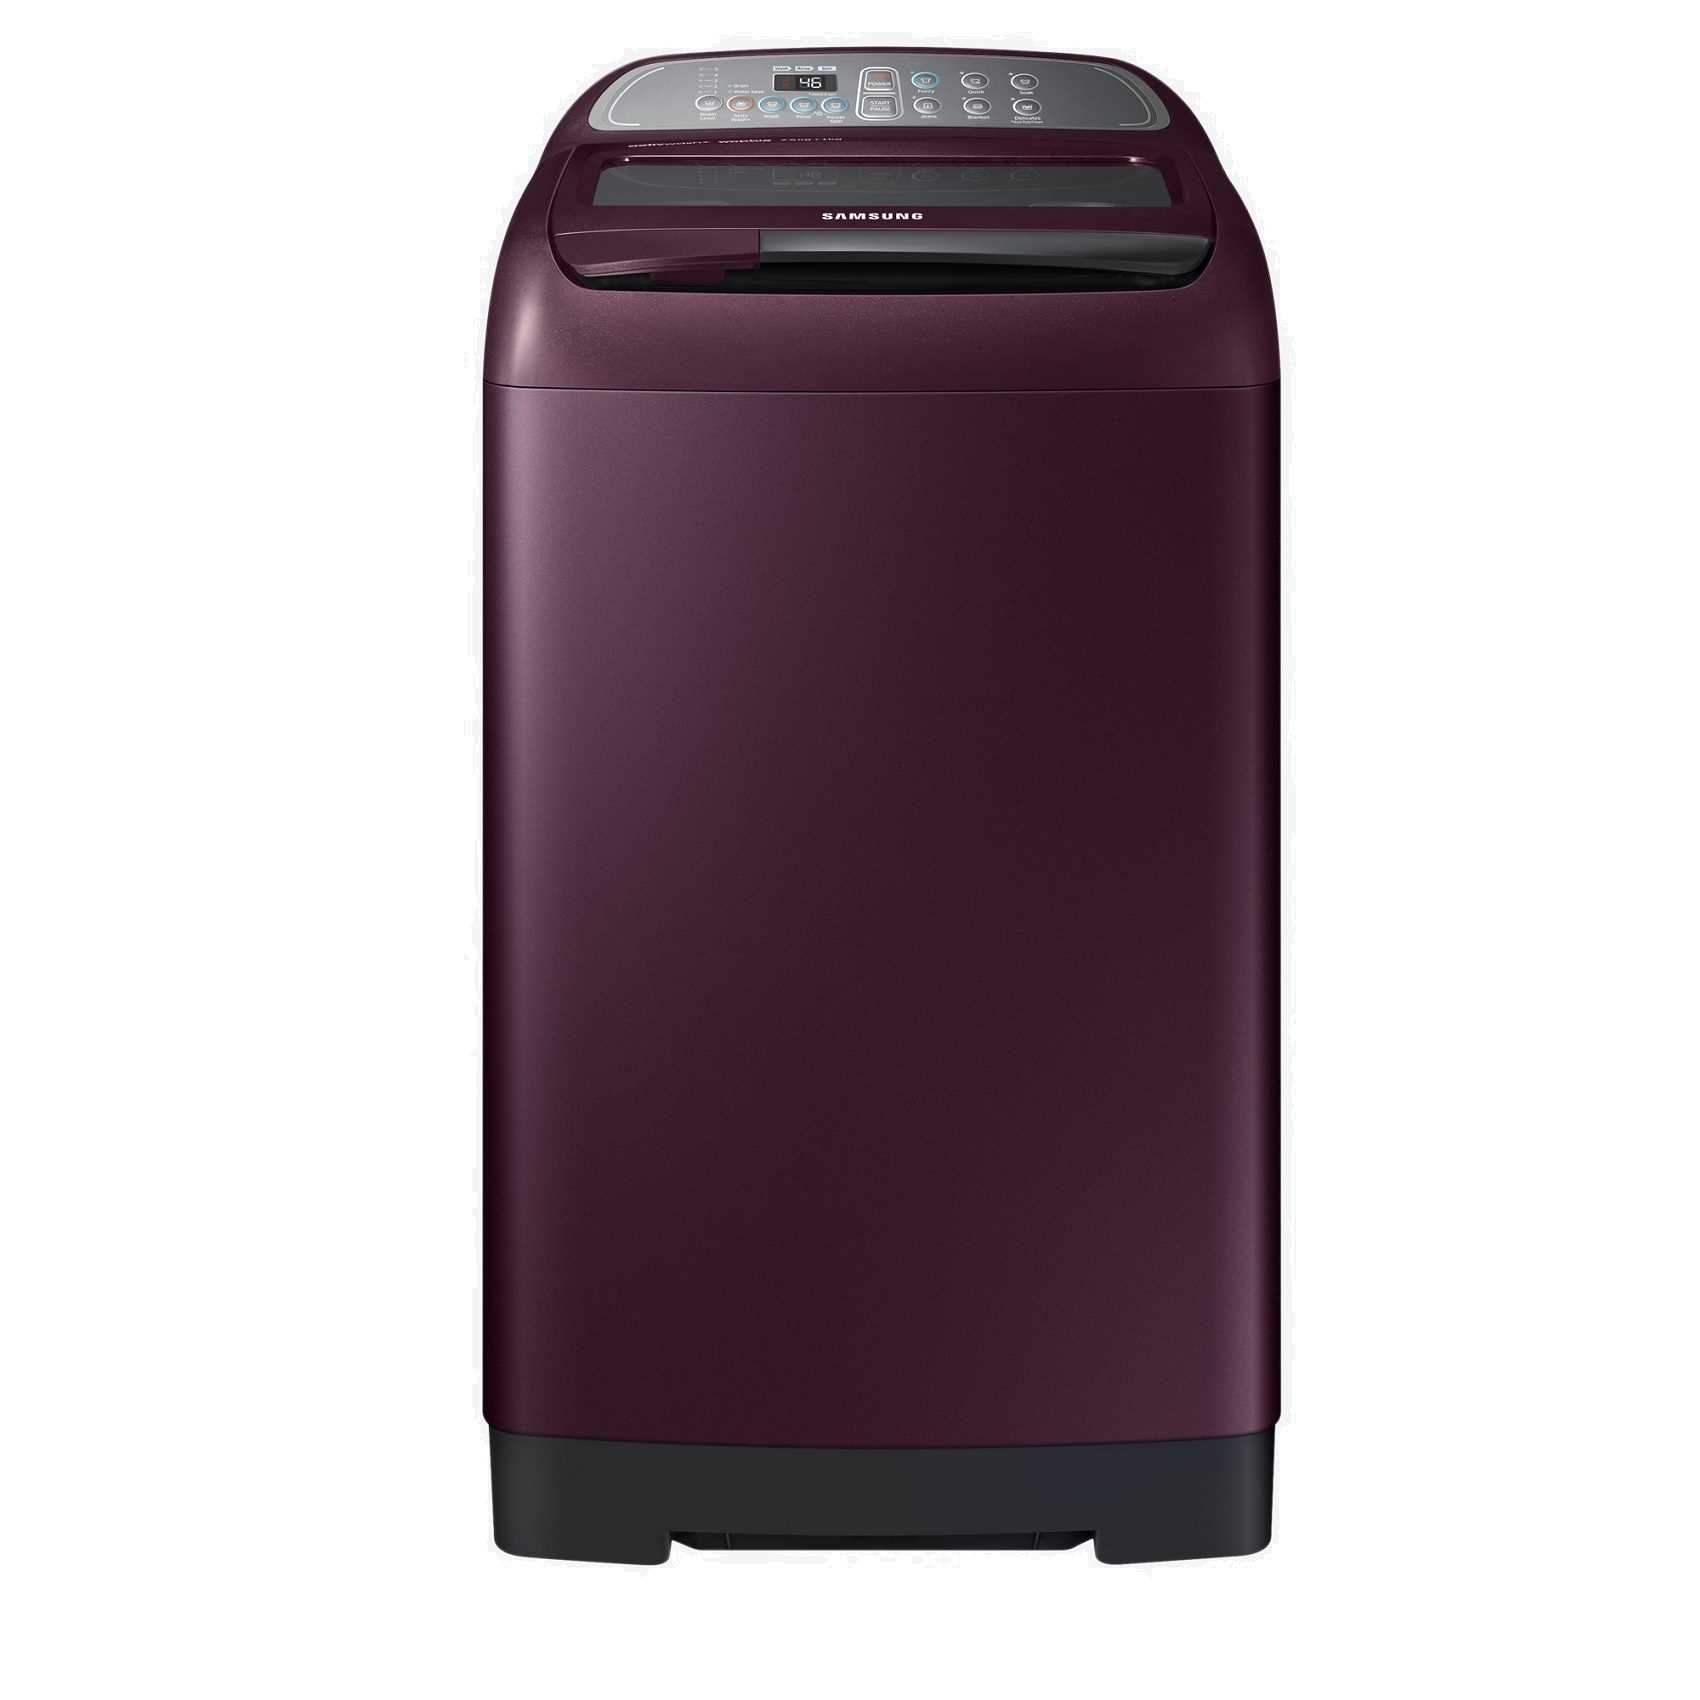 Samsung WA75M4000HP 7.5 Kg Fully Automatic Top Loading Washing Machine